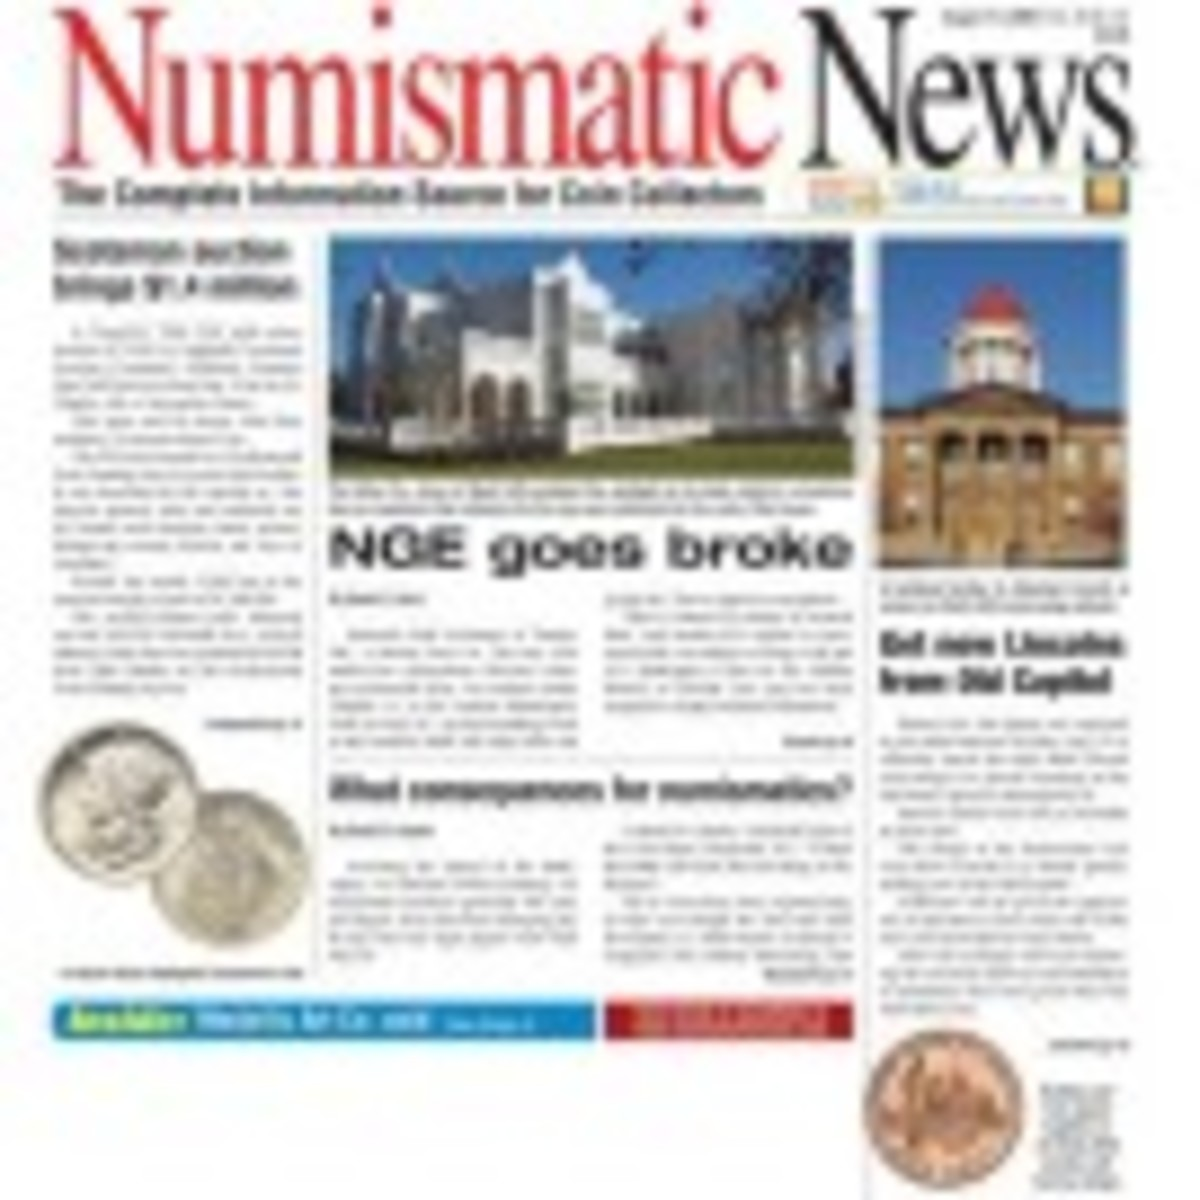 Numismatic News Magazine One Year Subscription